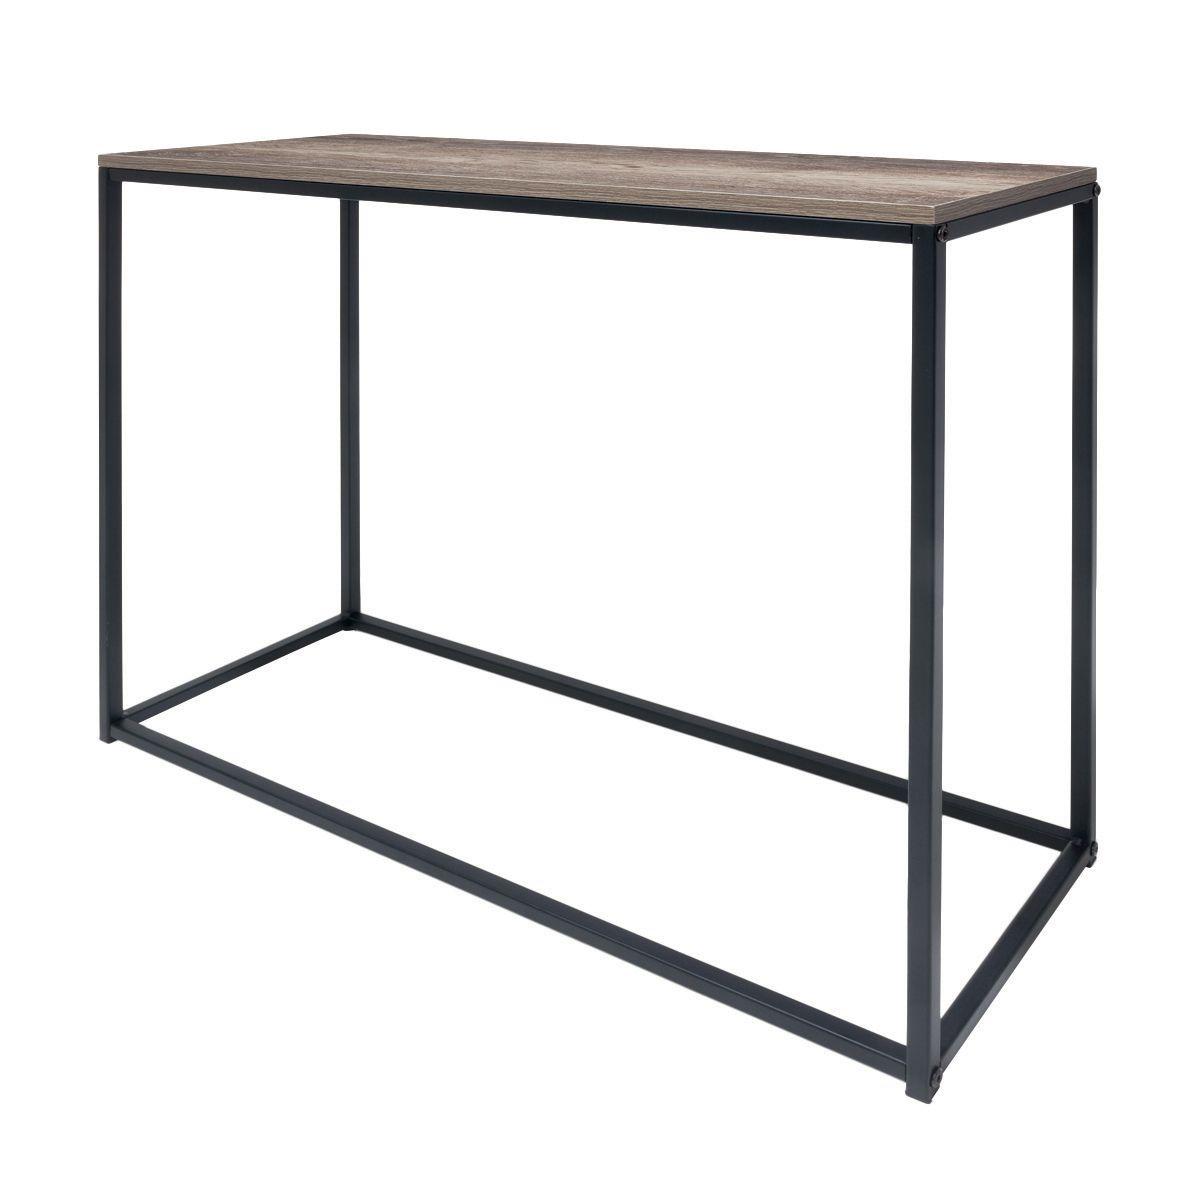 Industrial Hallway Table Kmart 29 72cm H X 80cm W X 30cm  # Notice Meuble Tv Benno